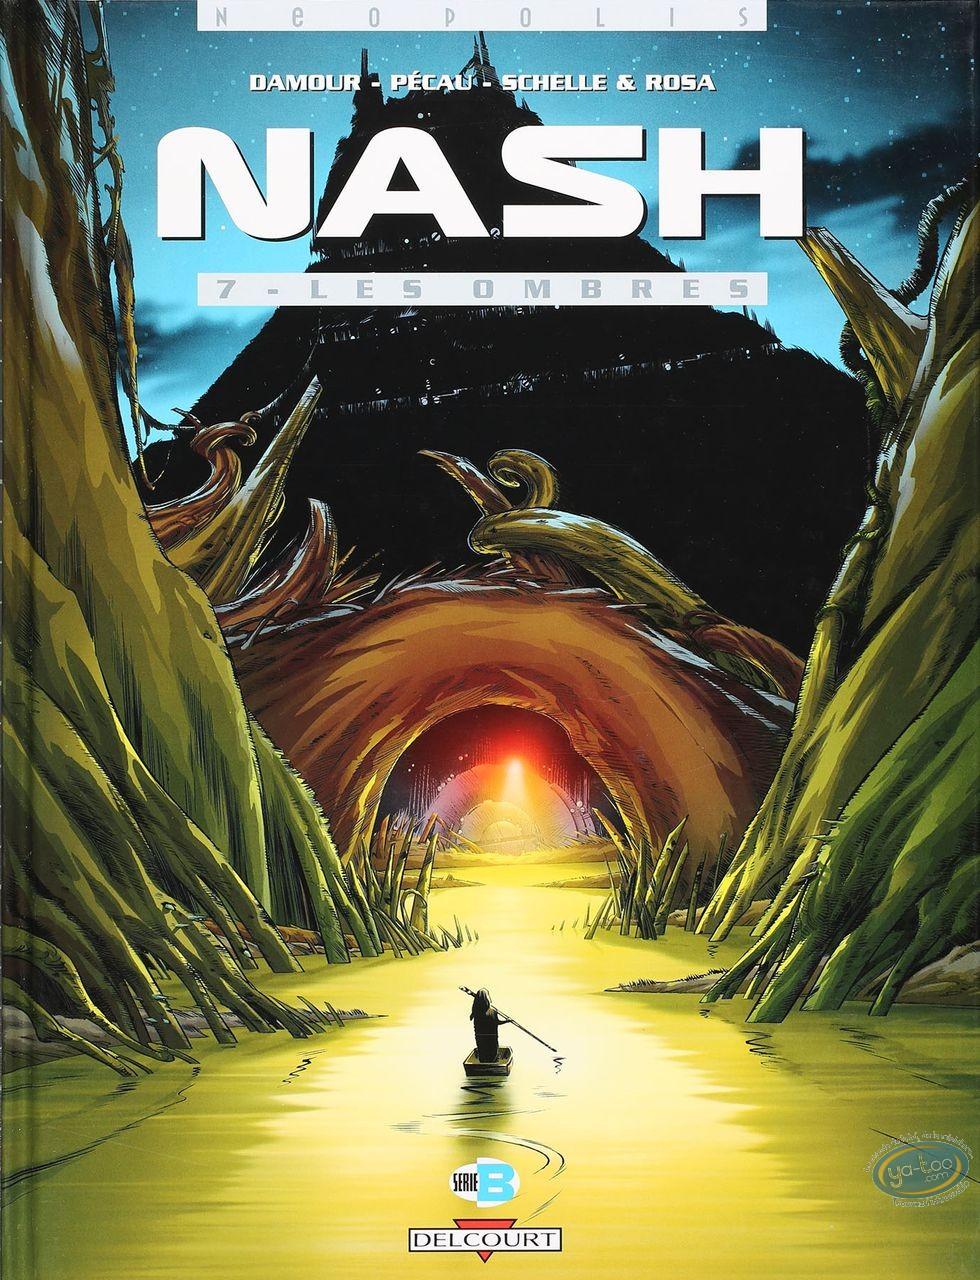 Listed European Comic Books, Nash : Les ombres